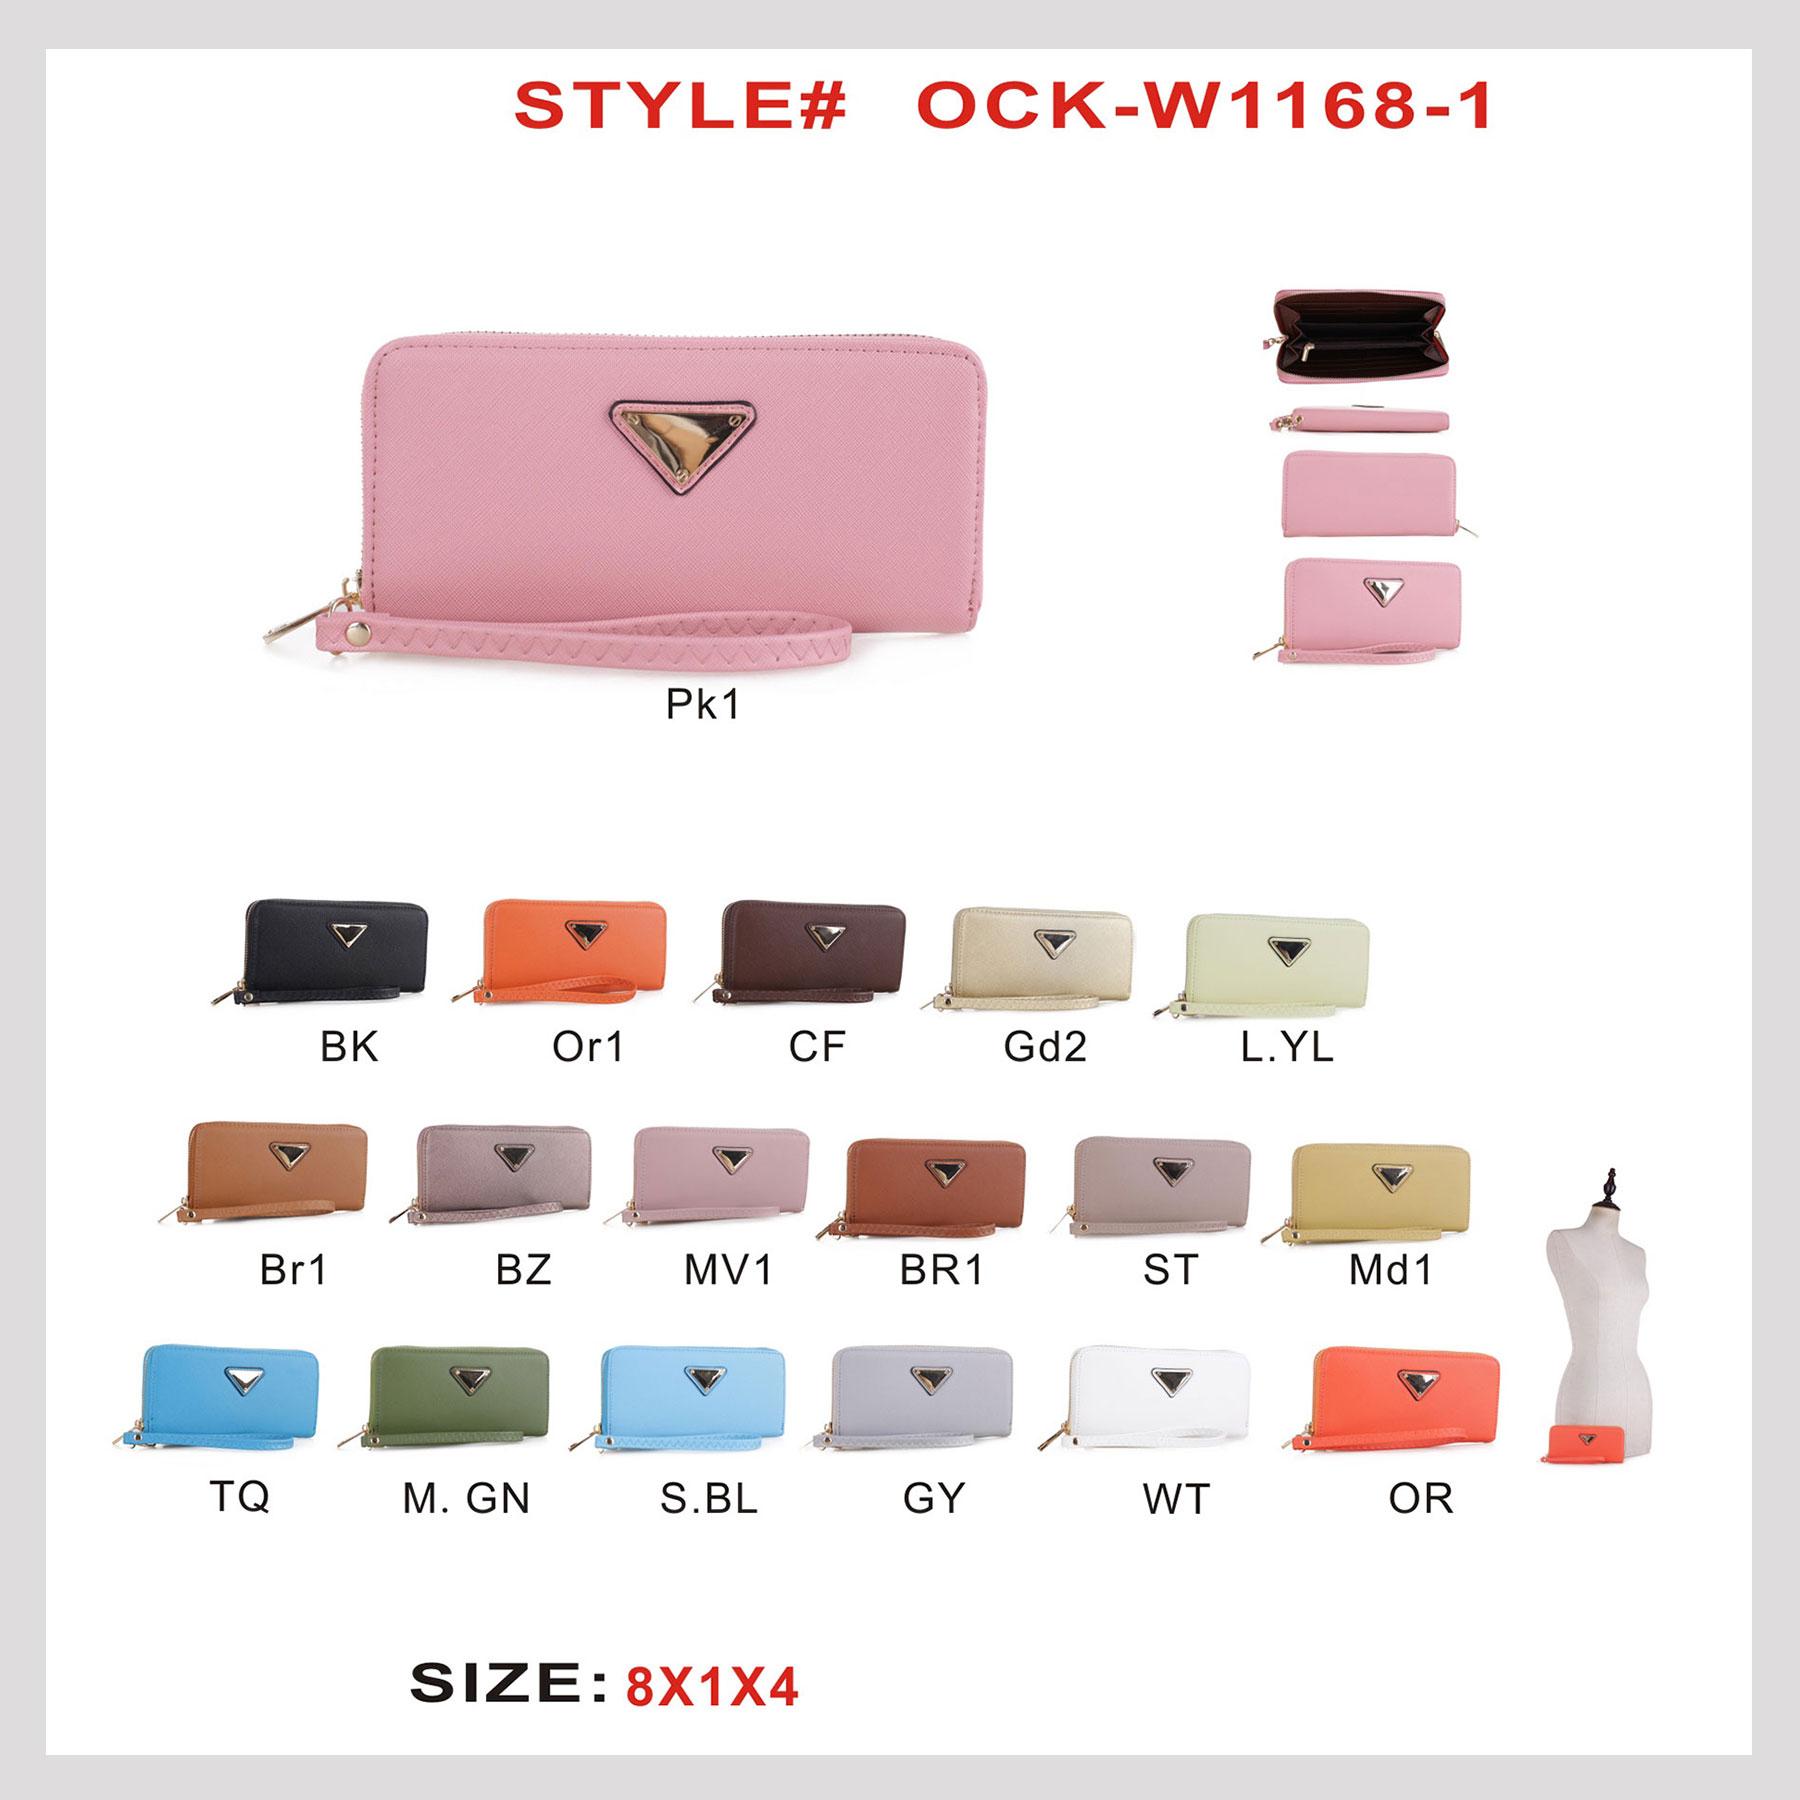 OCK-W1168-1.jpg